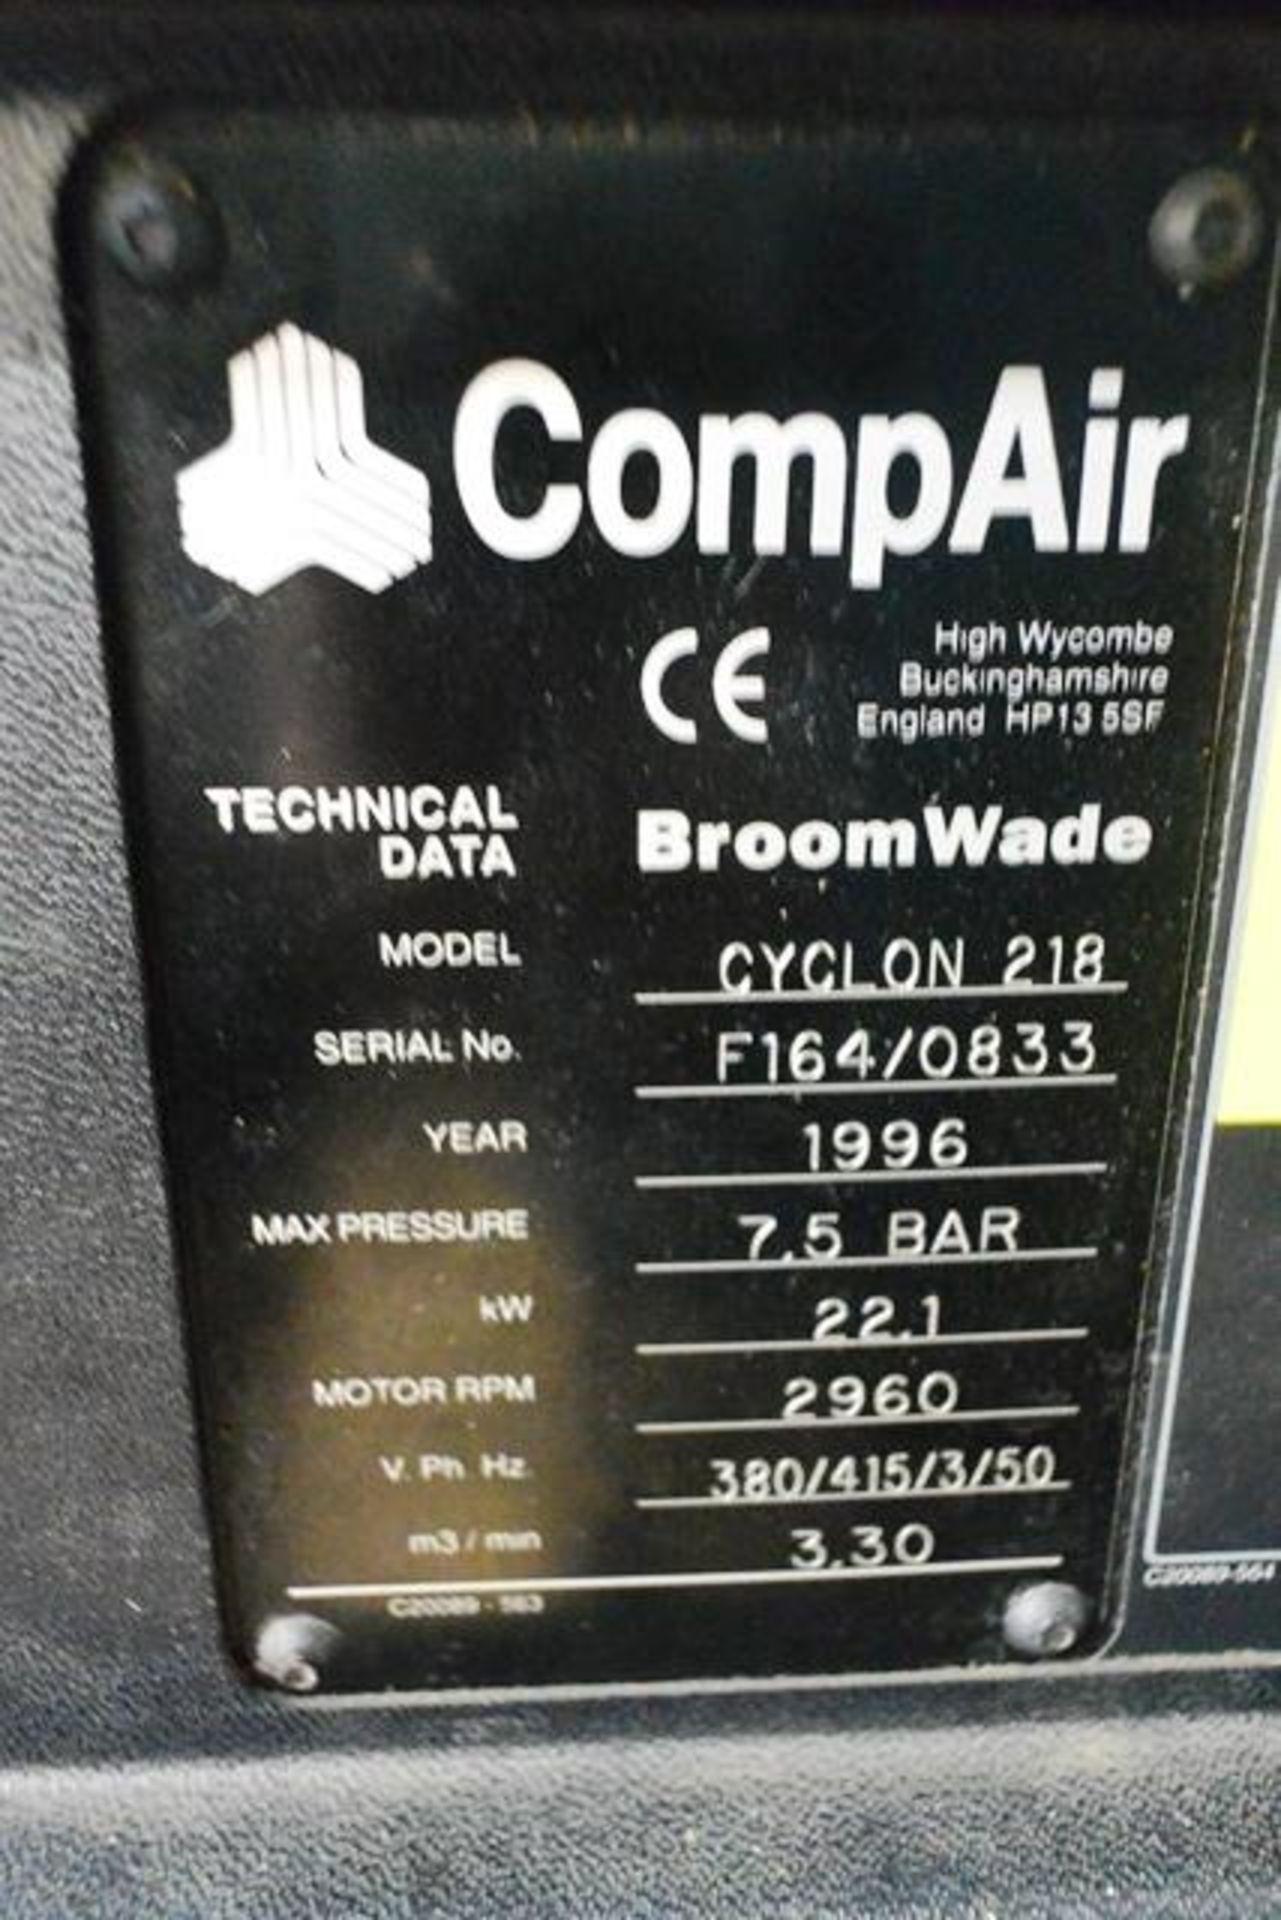 Compair Cyclon 218 air compressor, serial no. F164/0833 (1996), 7.5 bar, 22.1kw, 3 phase, Last... - Image 2 of 2